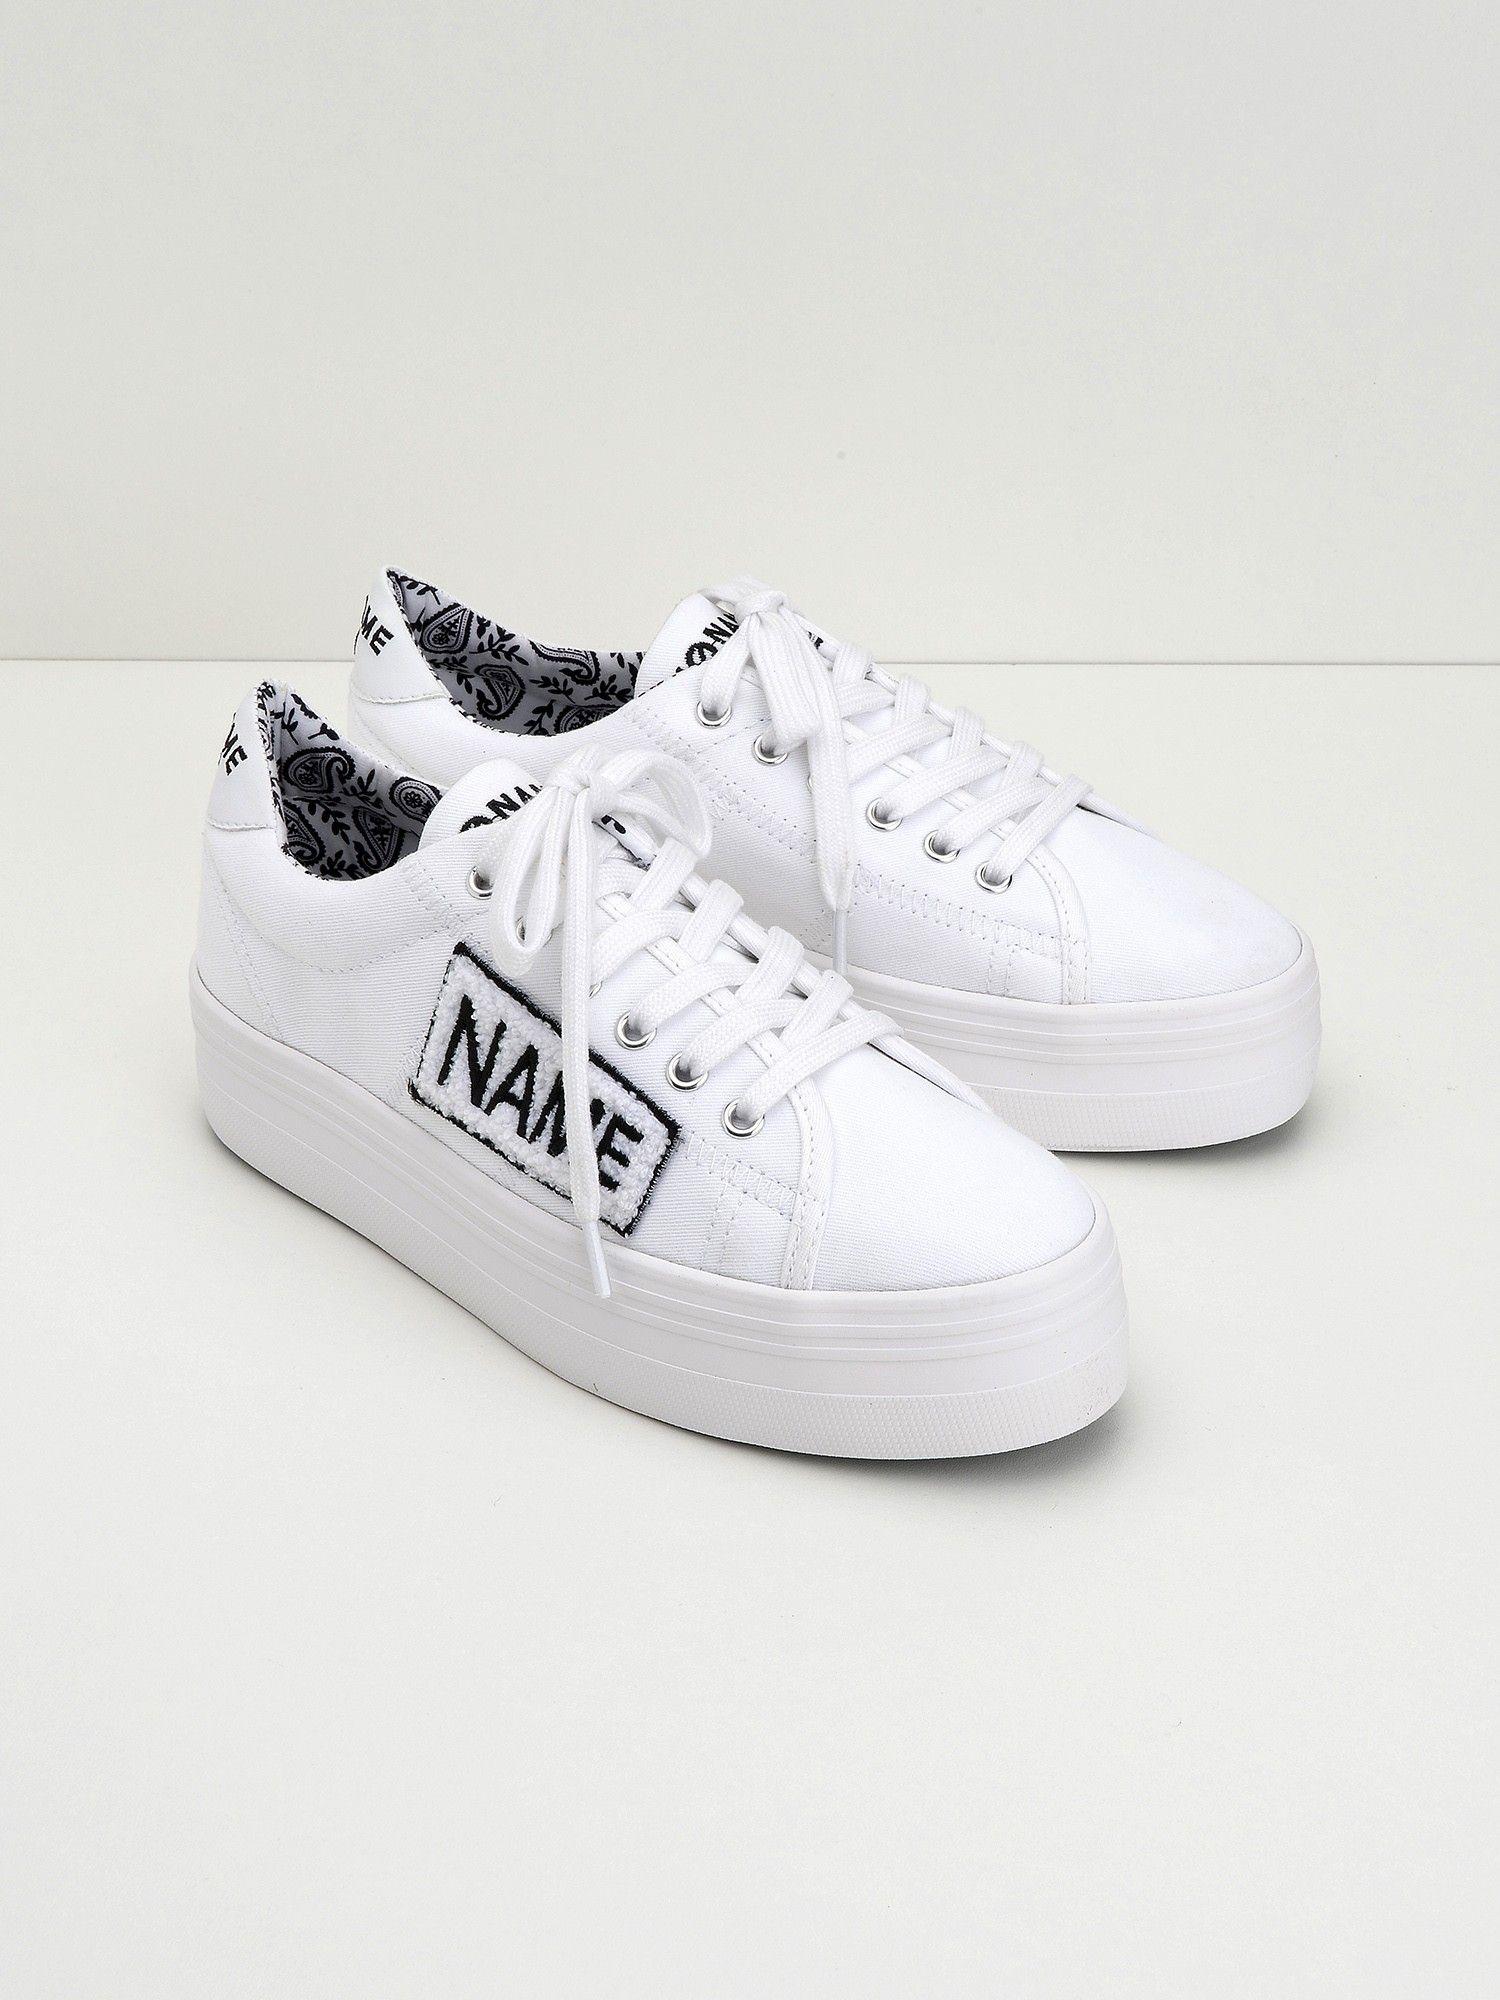 No Name Plato Sneaker - Twill Patch - White   1990 1998 Fashion ... 86ddf41b5f7d